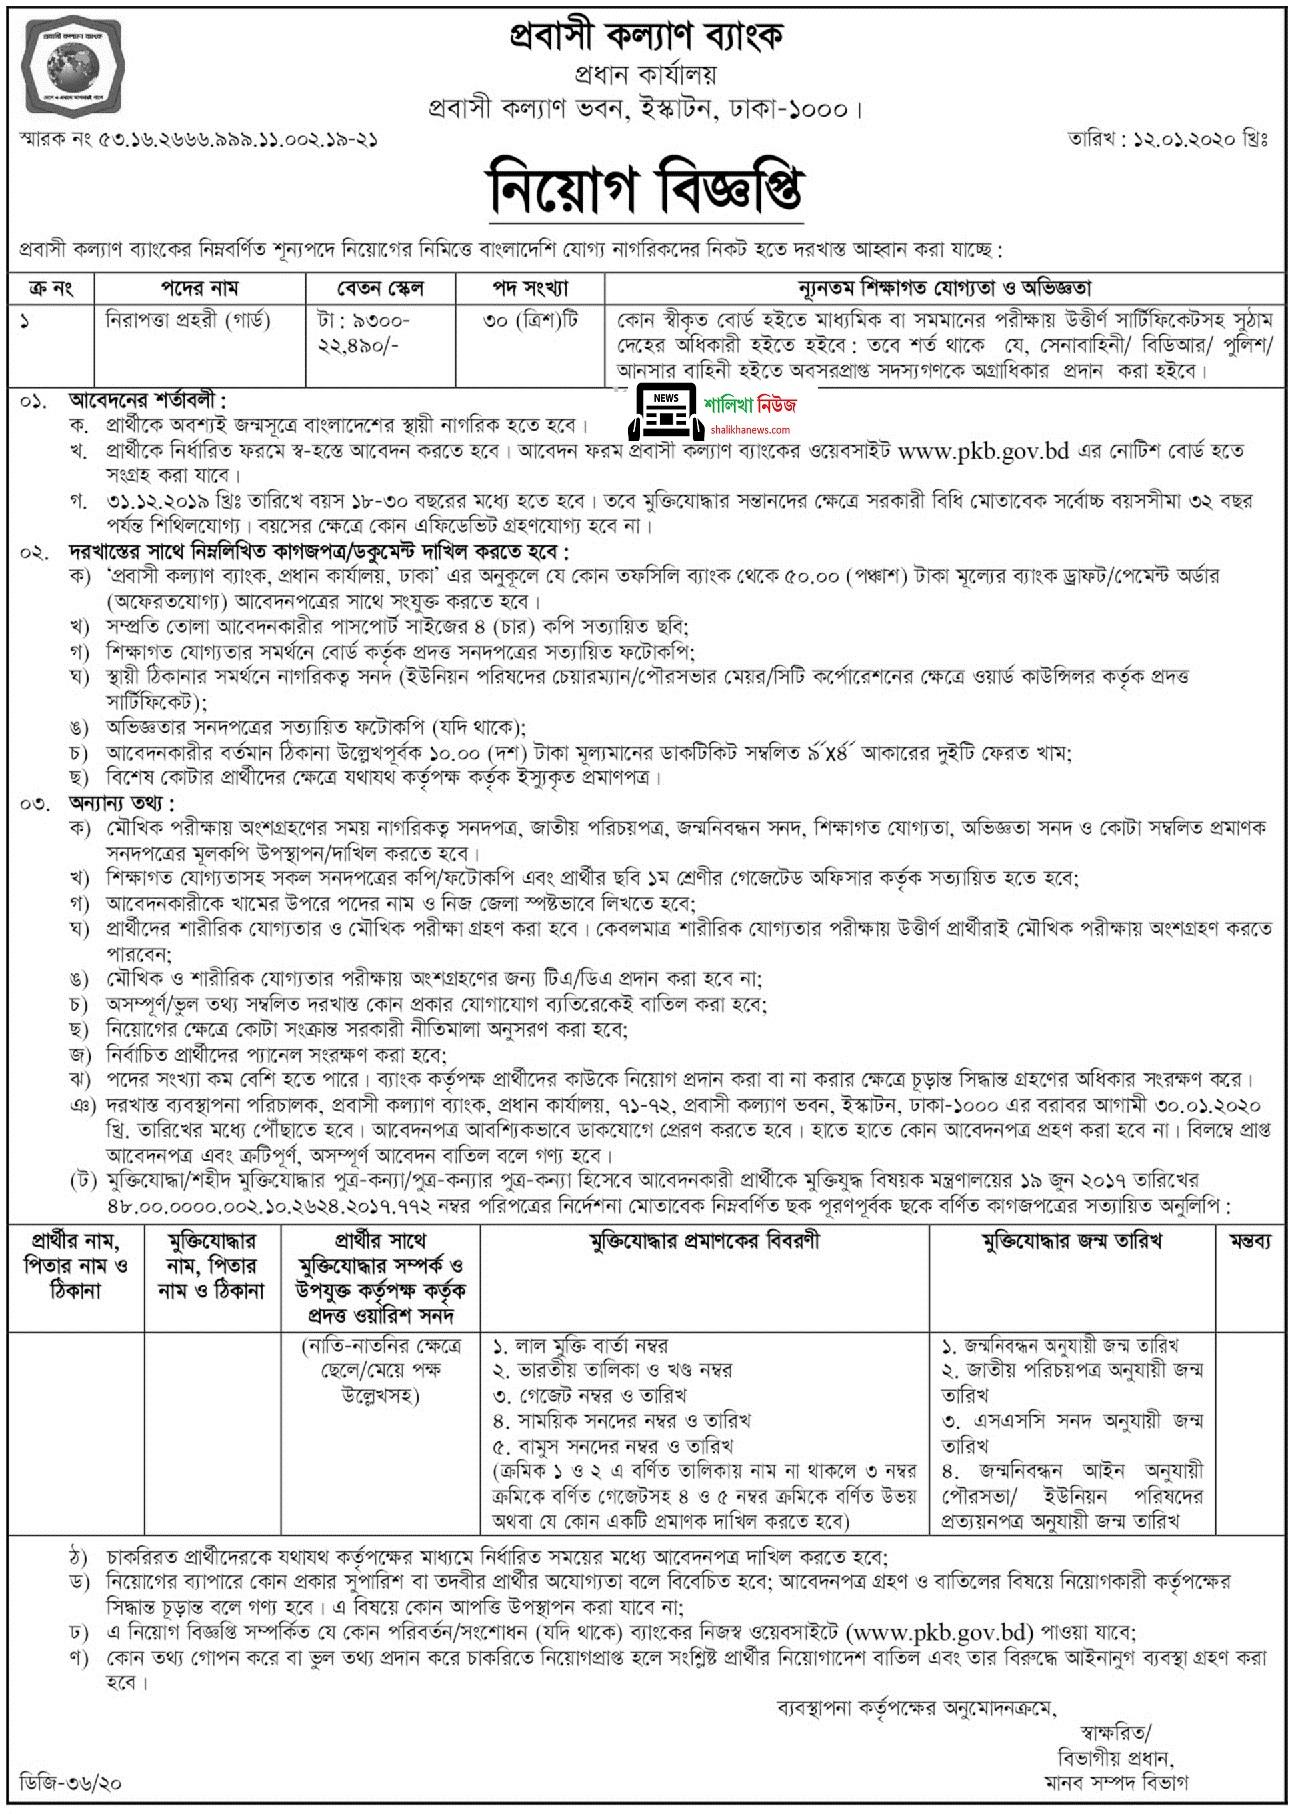 Probashi Kallyan Bank Job 2020